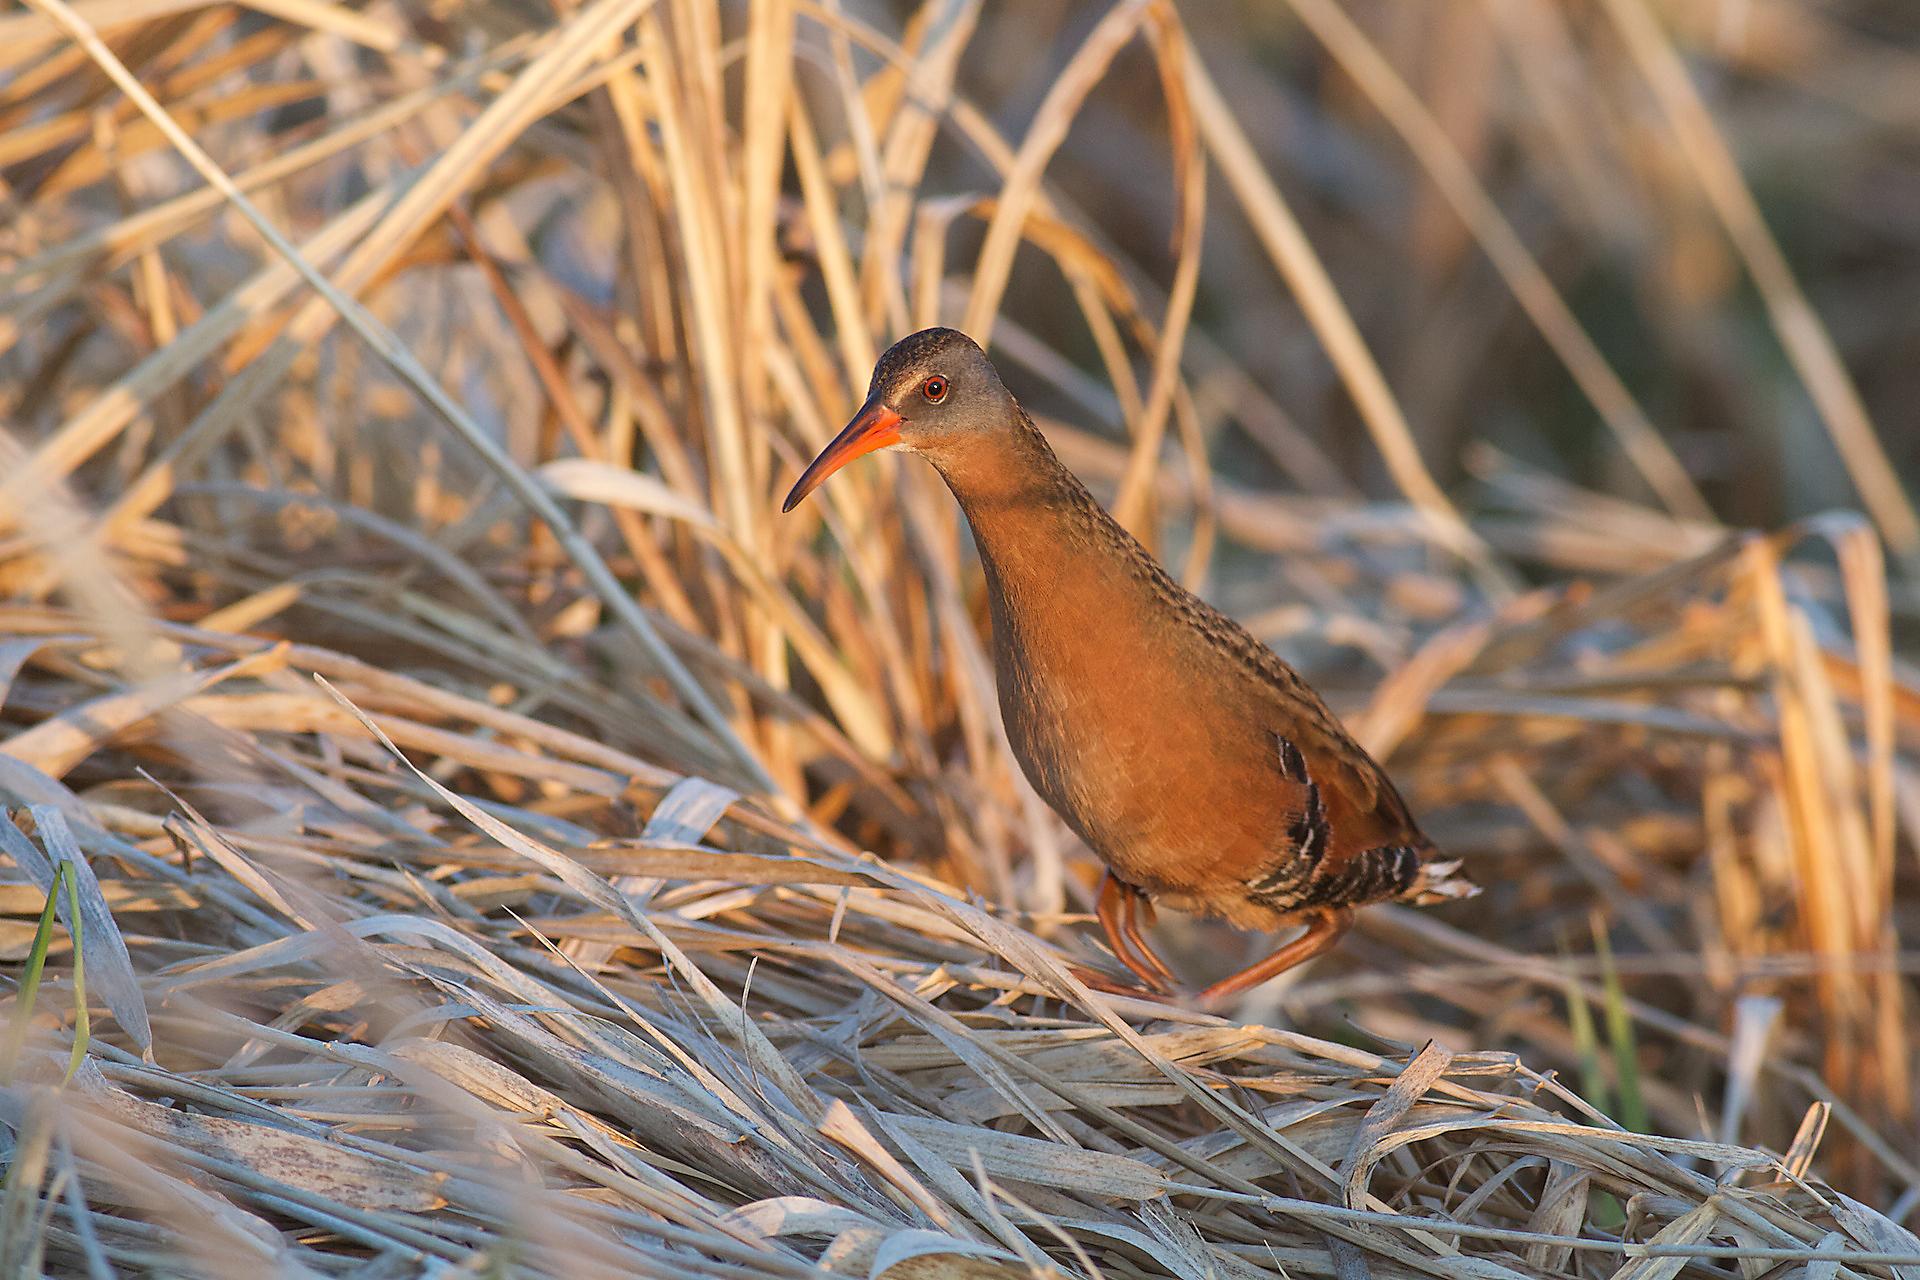 best bird photos 2015 the photonaturalist